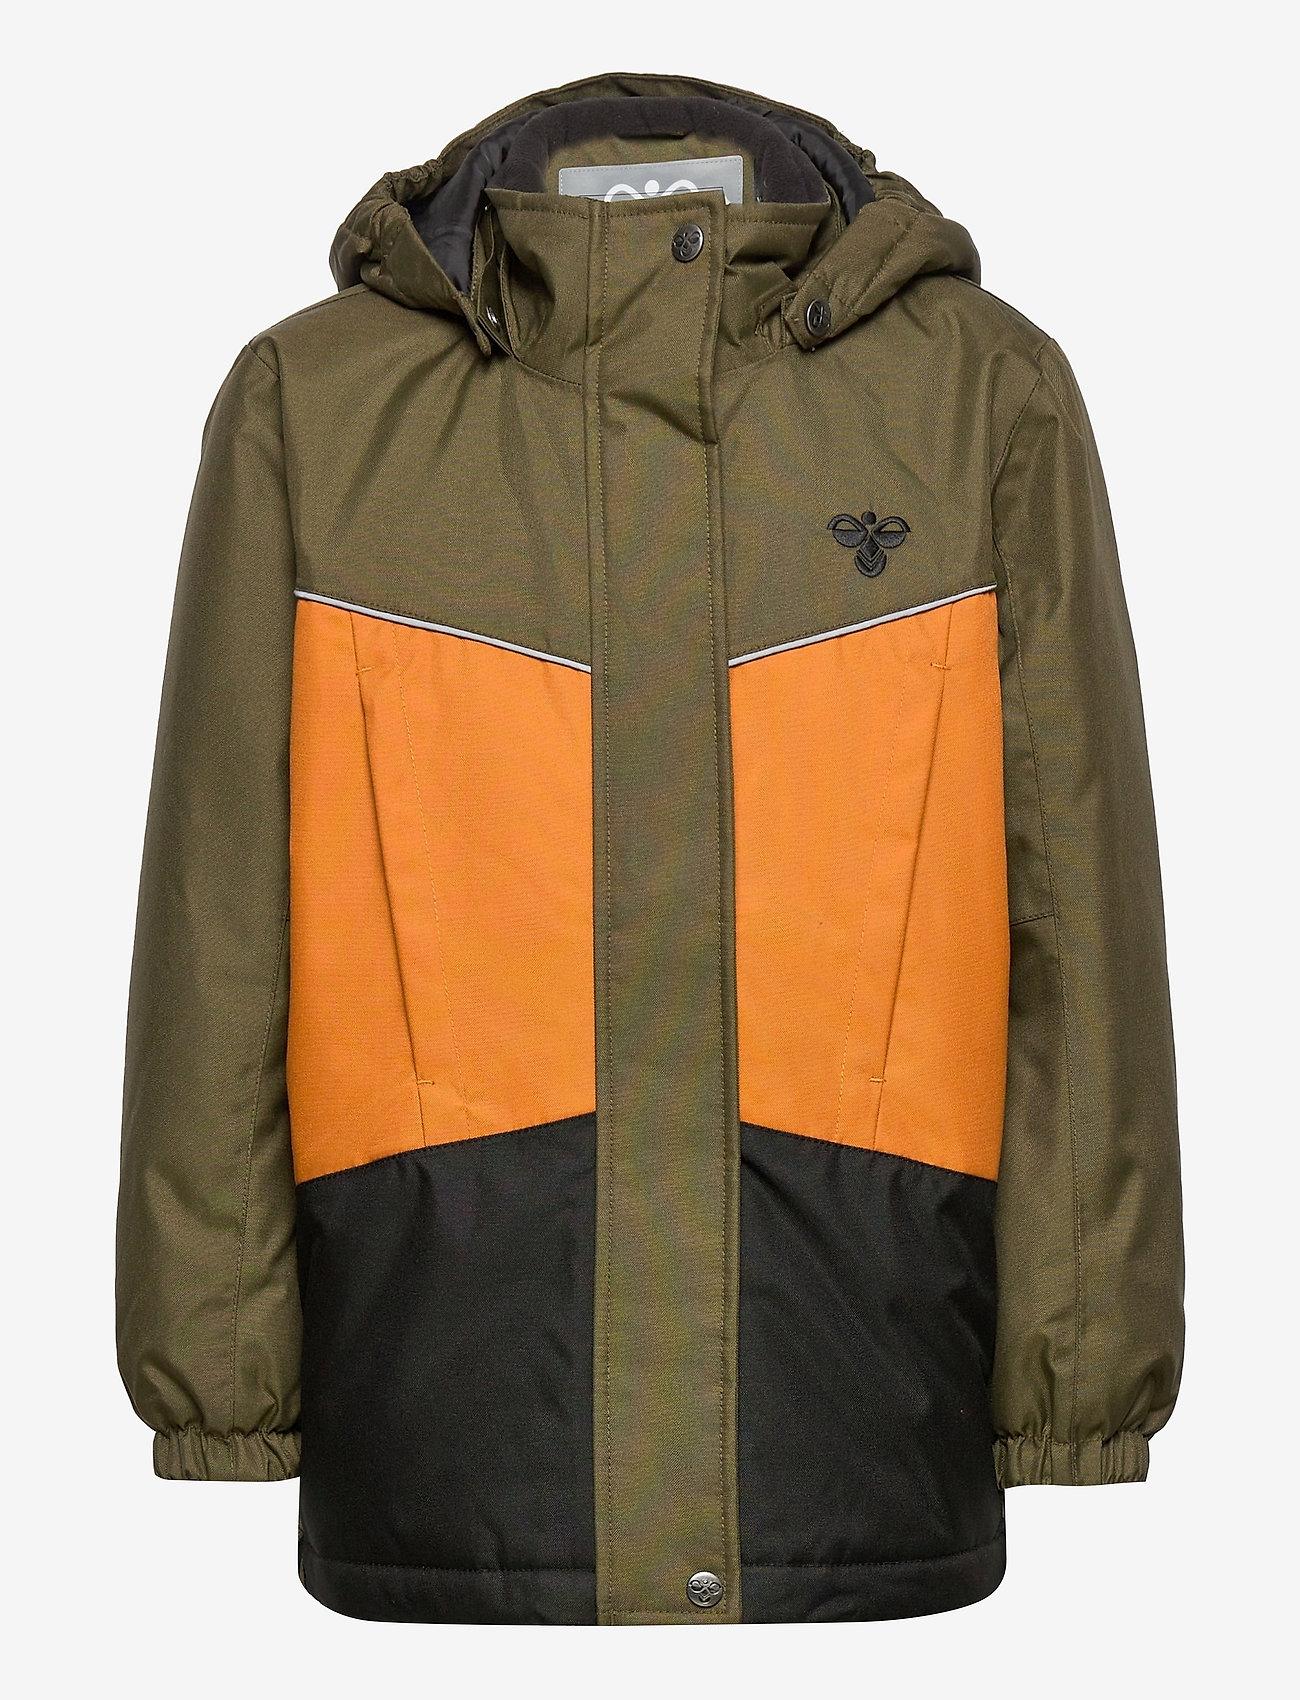 Hummel - hmlCONRAD JACKET - insulated jackets - olive night - 0